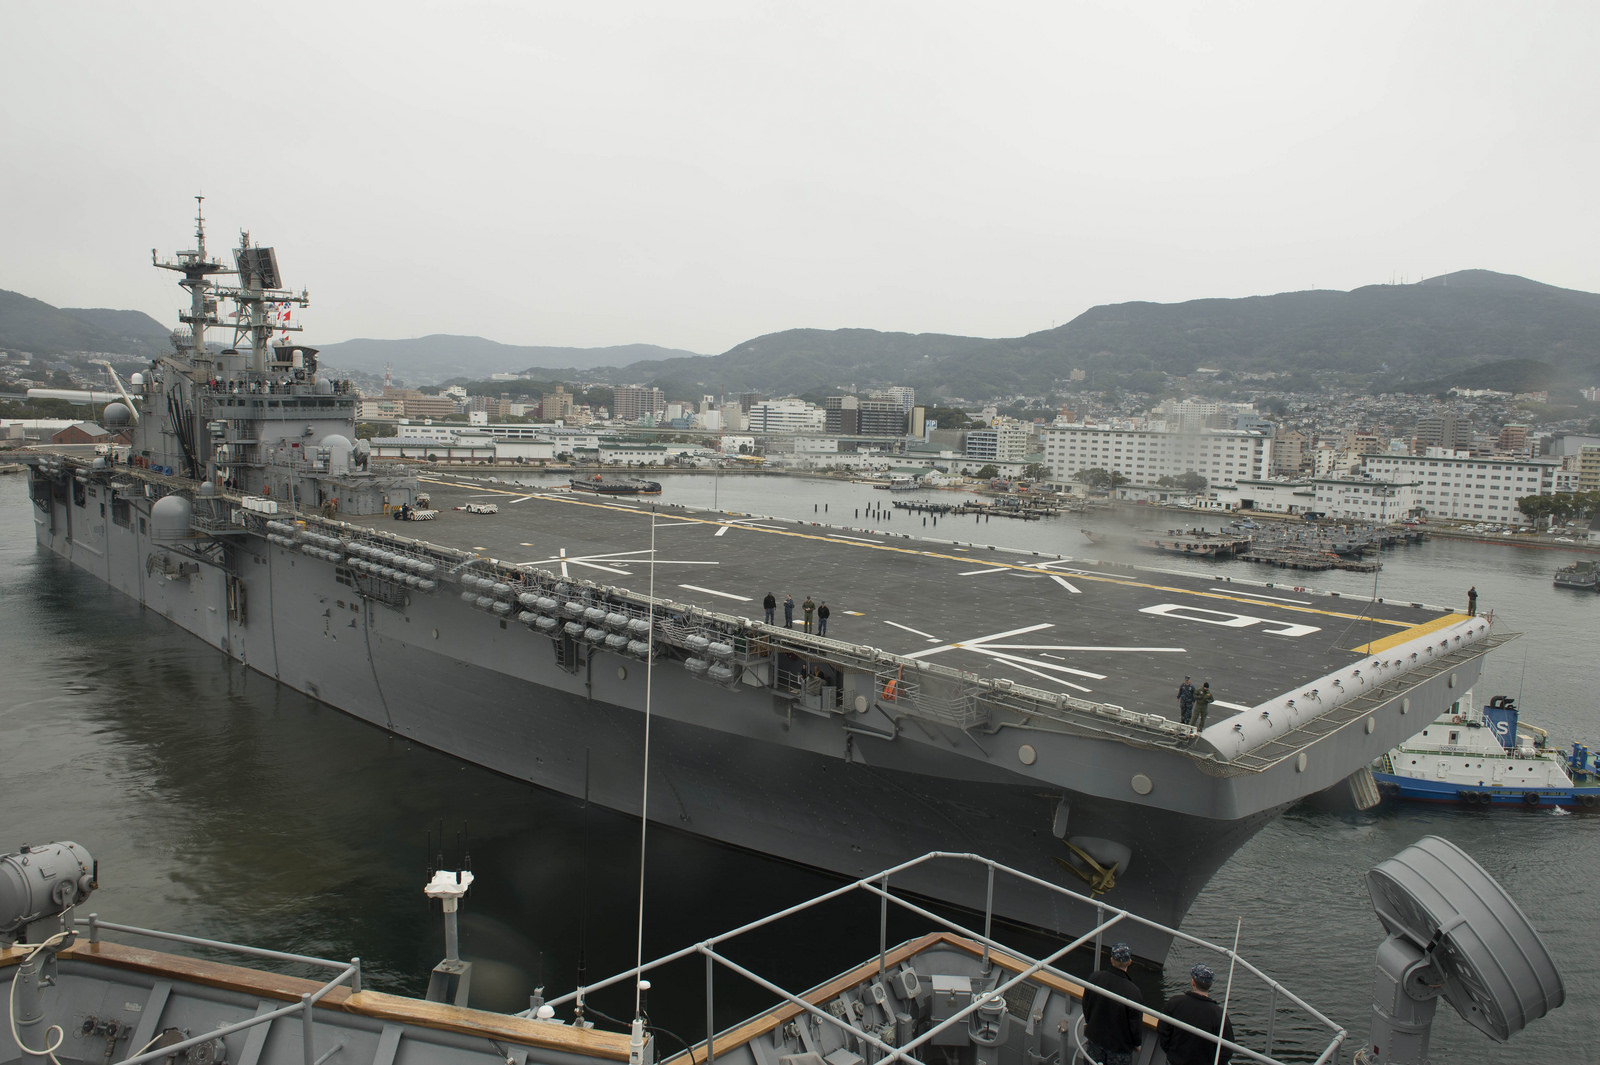 USS BONHOMME RICHARD LHD-6 Auslaufen Sasebo am 17.02.2014 Bild: U.S. Navy